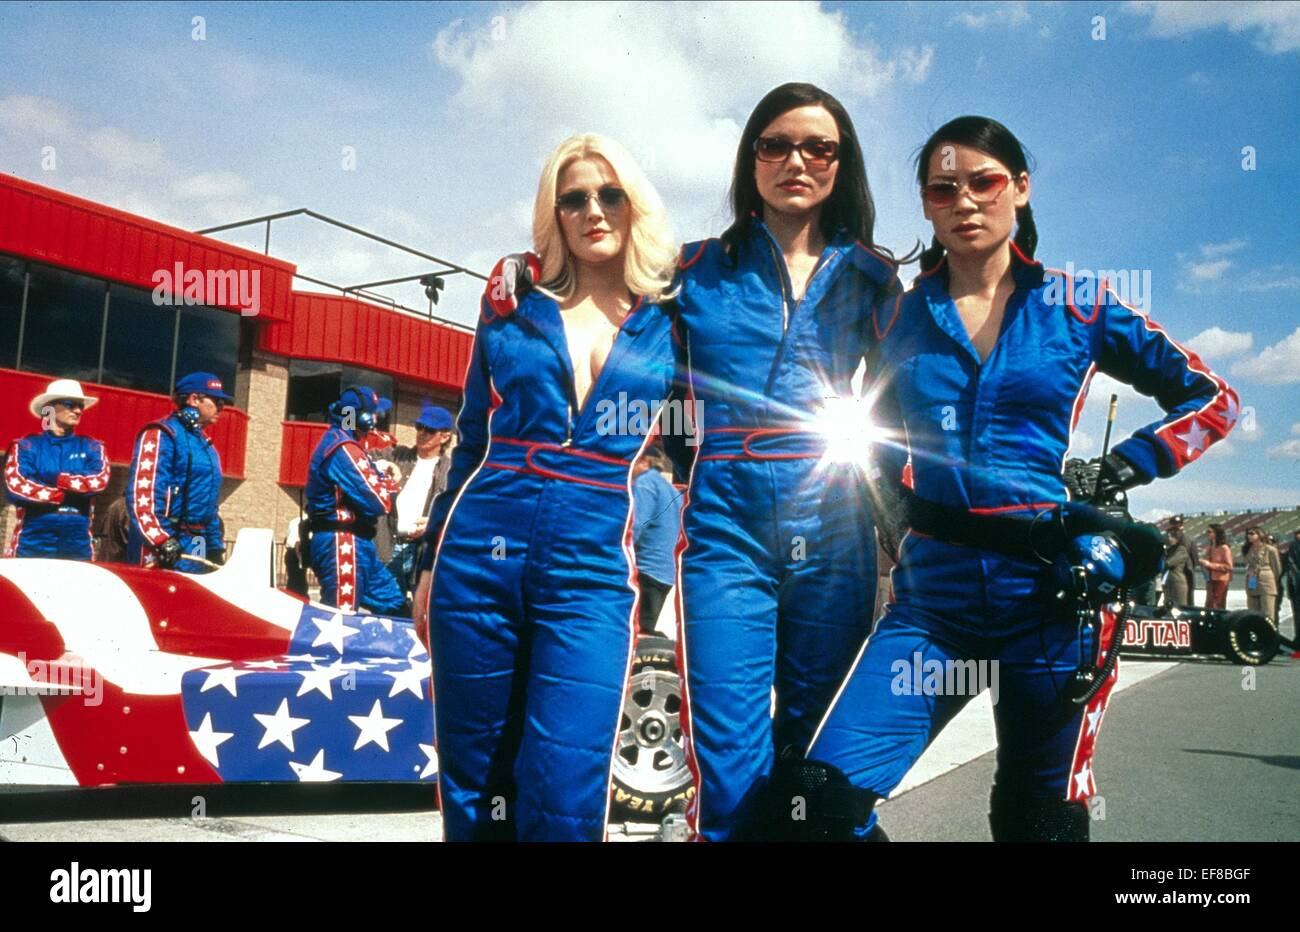 DREW BARRYMORE CAMERON DIAZ & LUCY LIU CHARLIE'S ANGELS ... Charlies Angels 2000